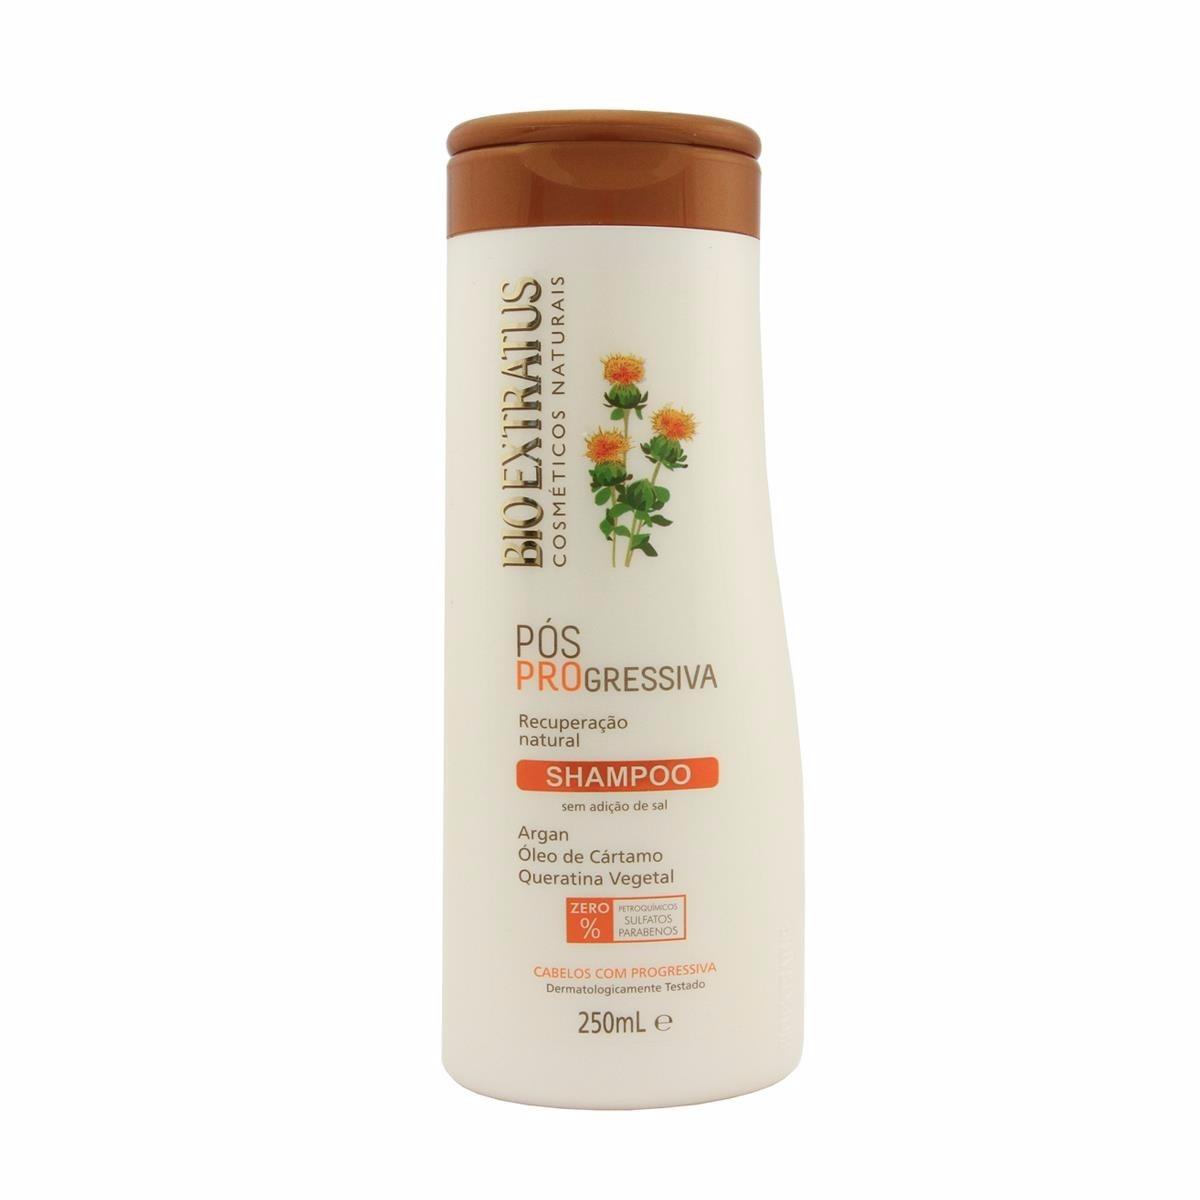 Shampoo Pos Progressiva Bio Extratus 250ml Low Poo R 25 50 Em